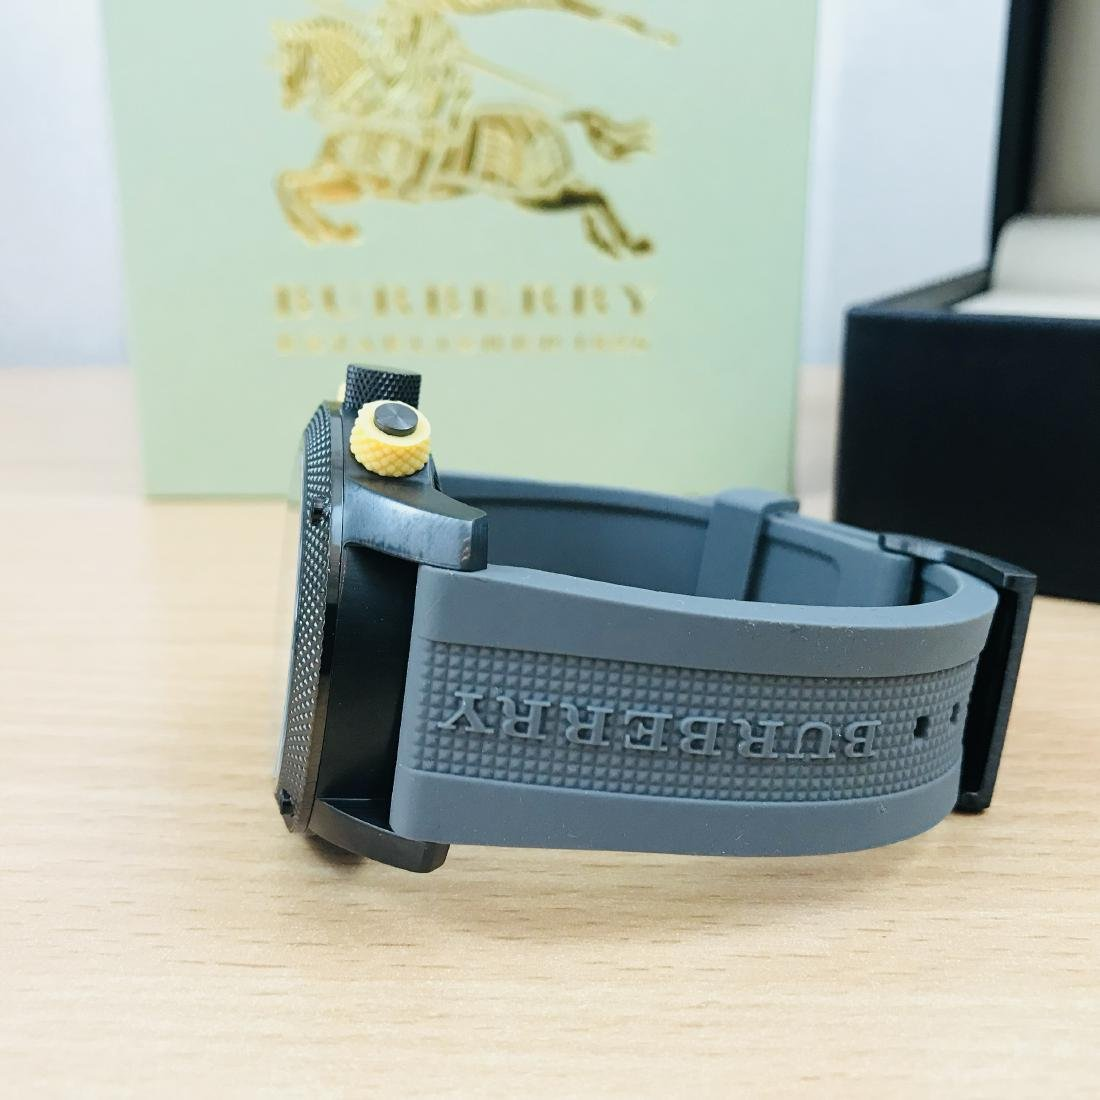 Burberry Endurance Swiss Made Men's Chronograph Watch - 5